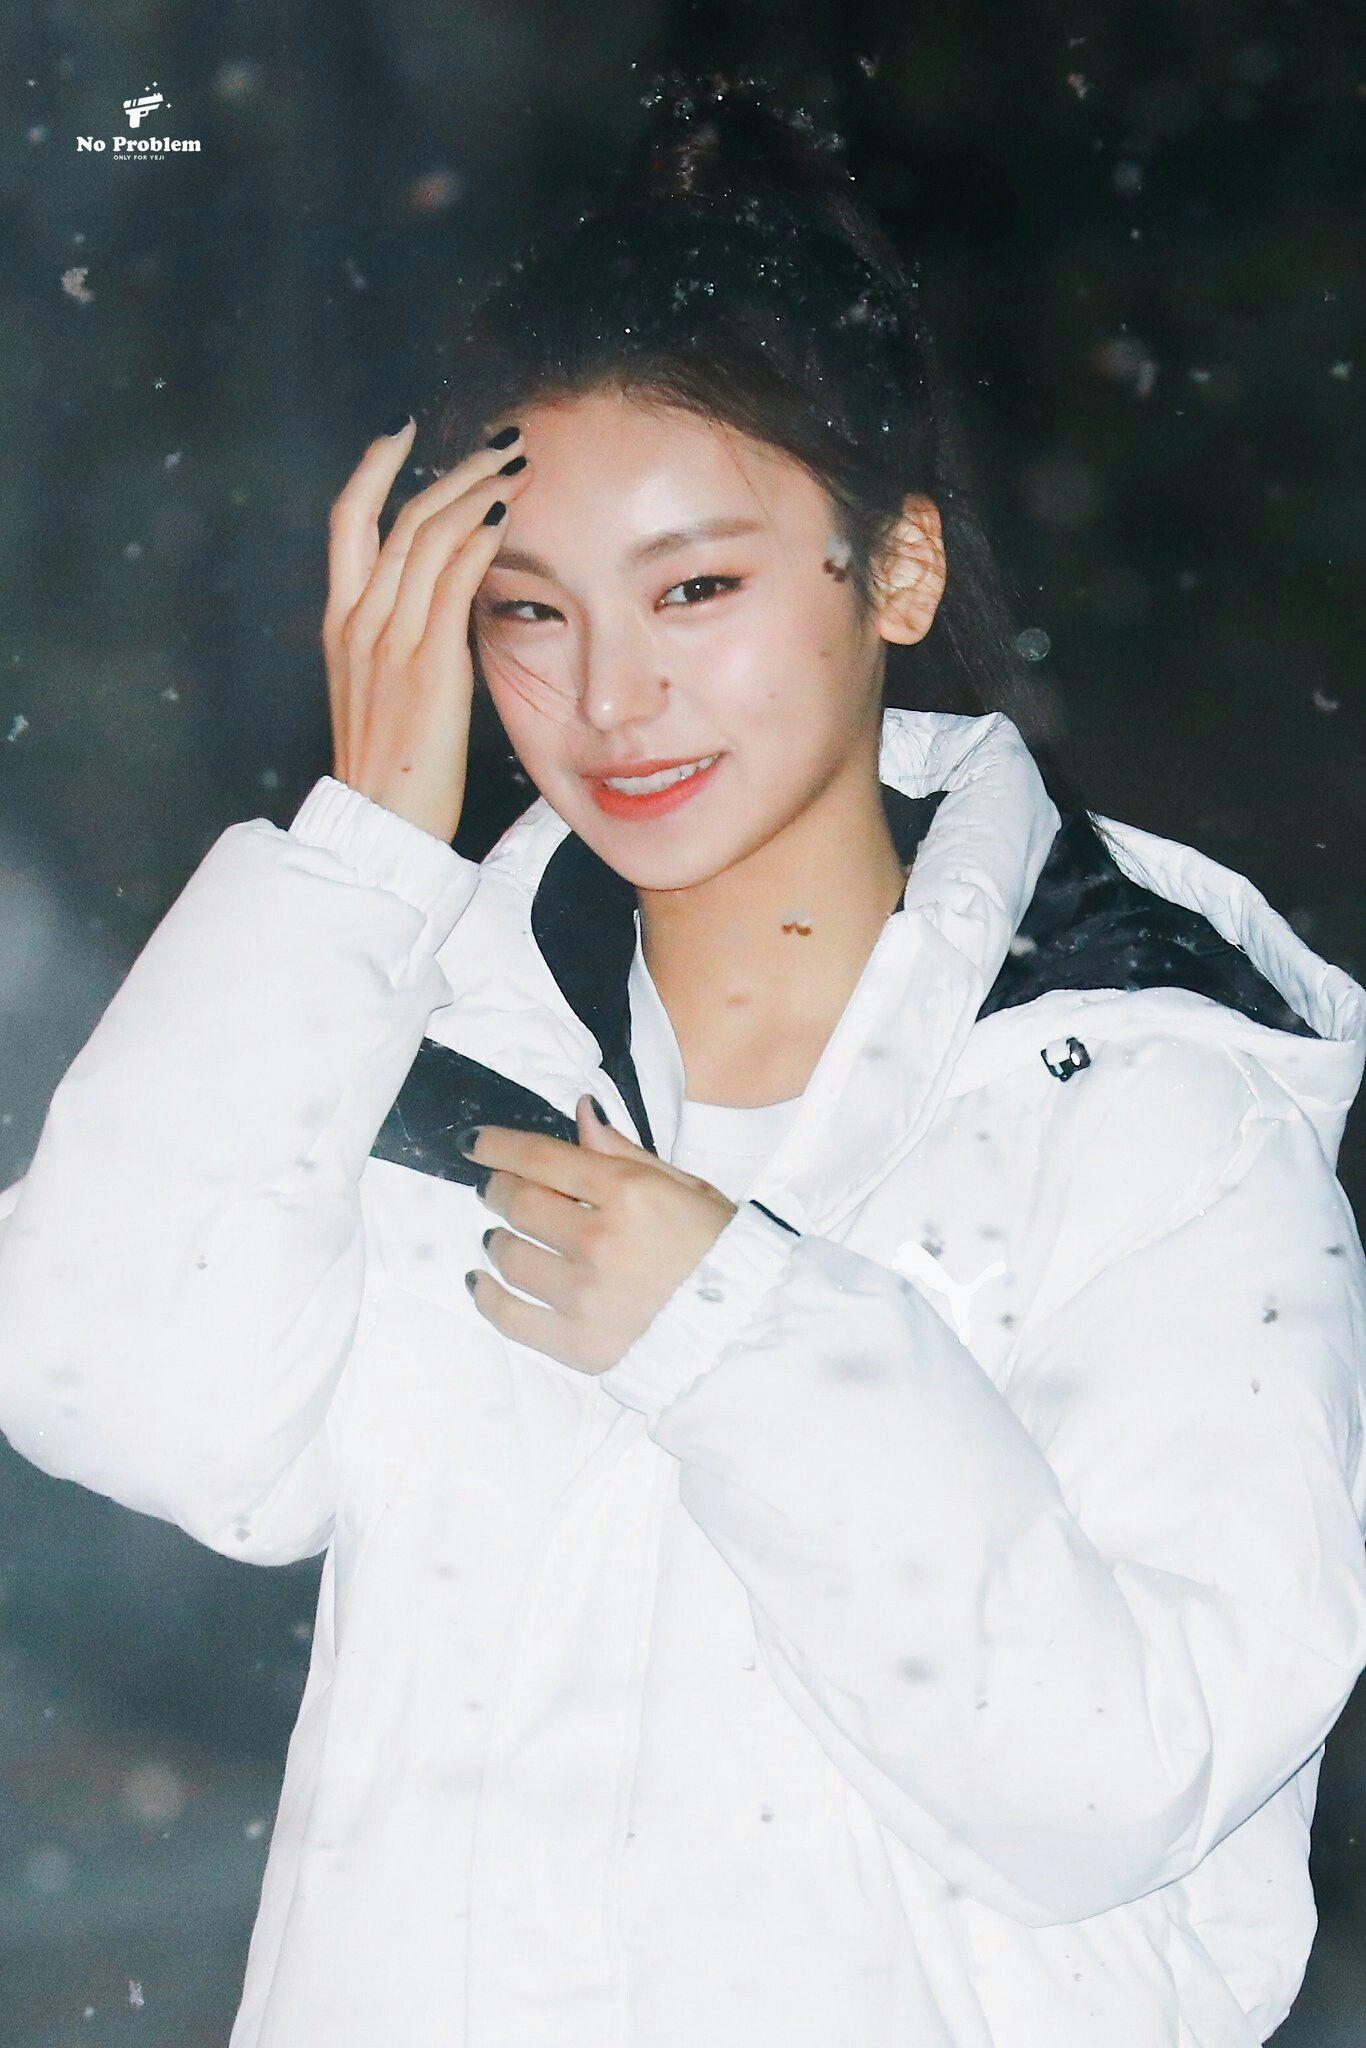 Pin by Itzy💋 on Yeji in 2019 | Kpop, South korean girls